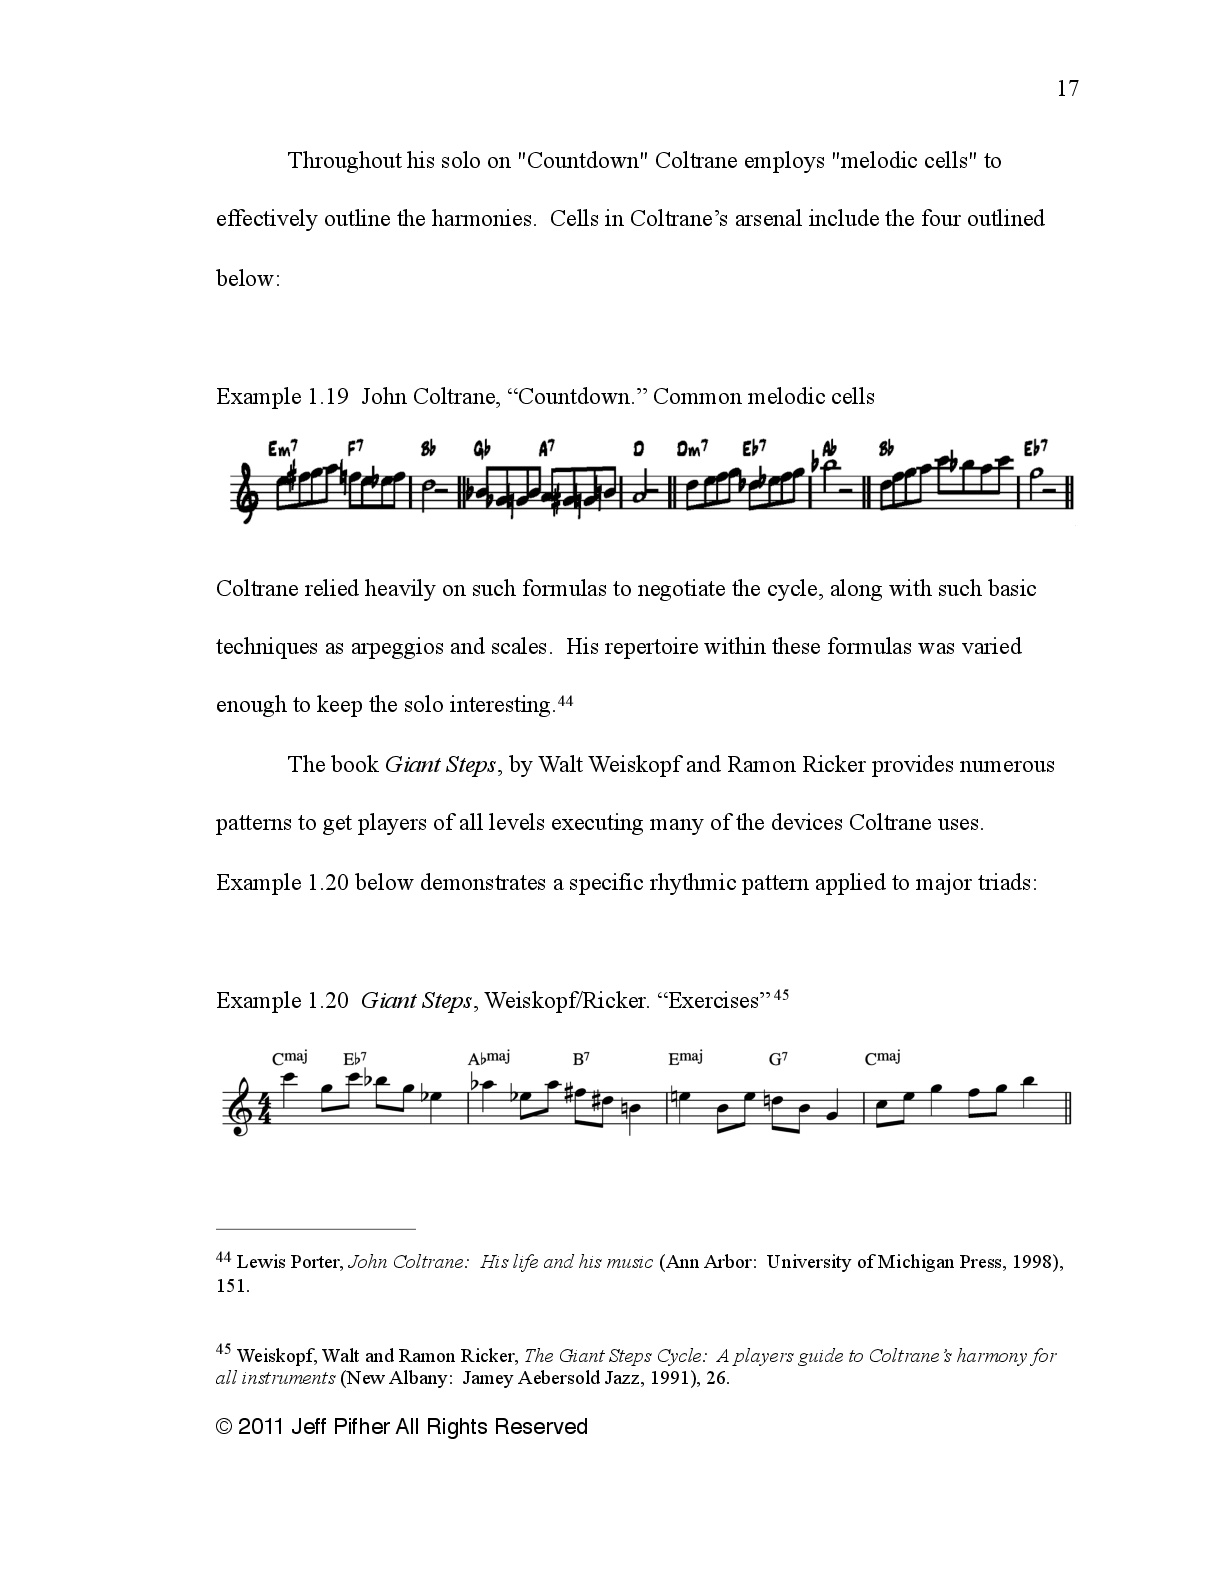 Jeff-Pifher-Academic-Series-Coltrane-Cycles-017.jpg